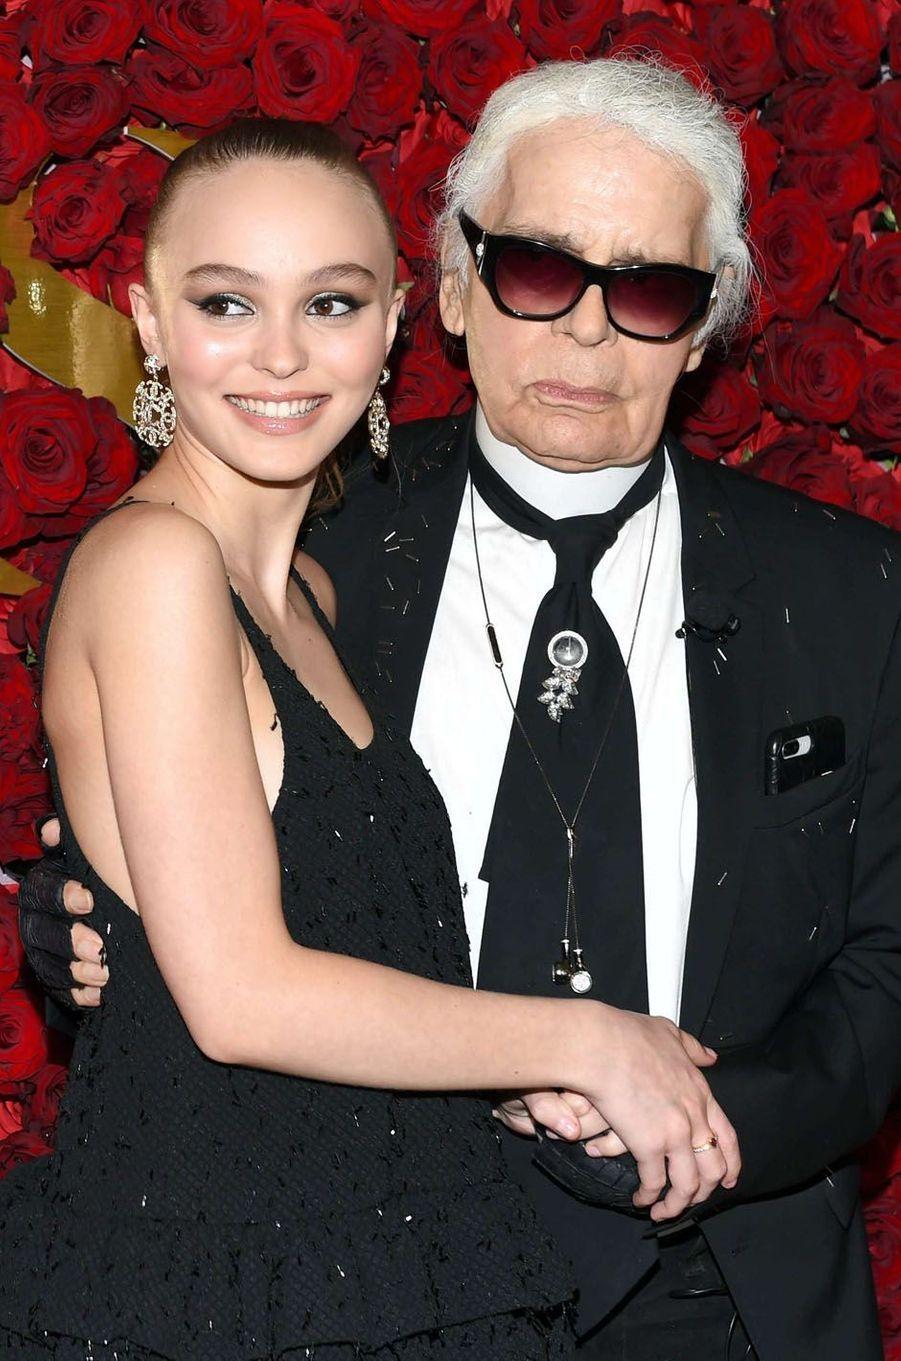 Lily-Rose Depp et Karl Lagerfeld lors des WWD Honors, le 24 octobre 2017 à New York.